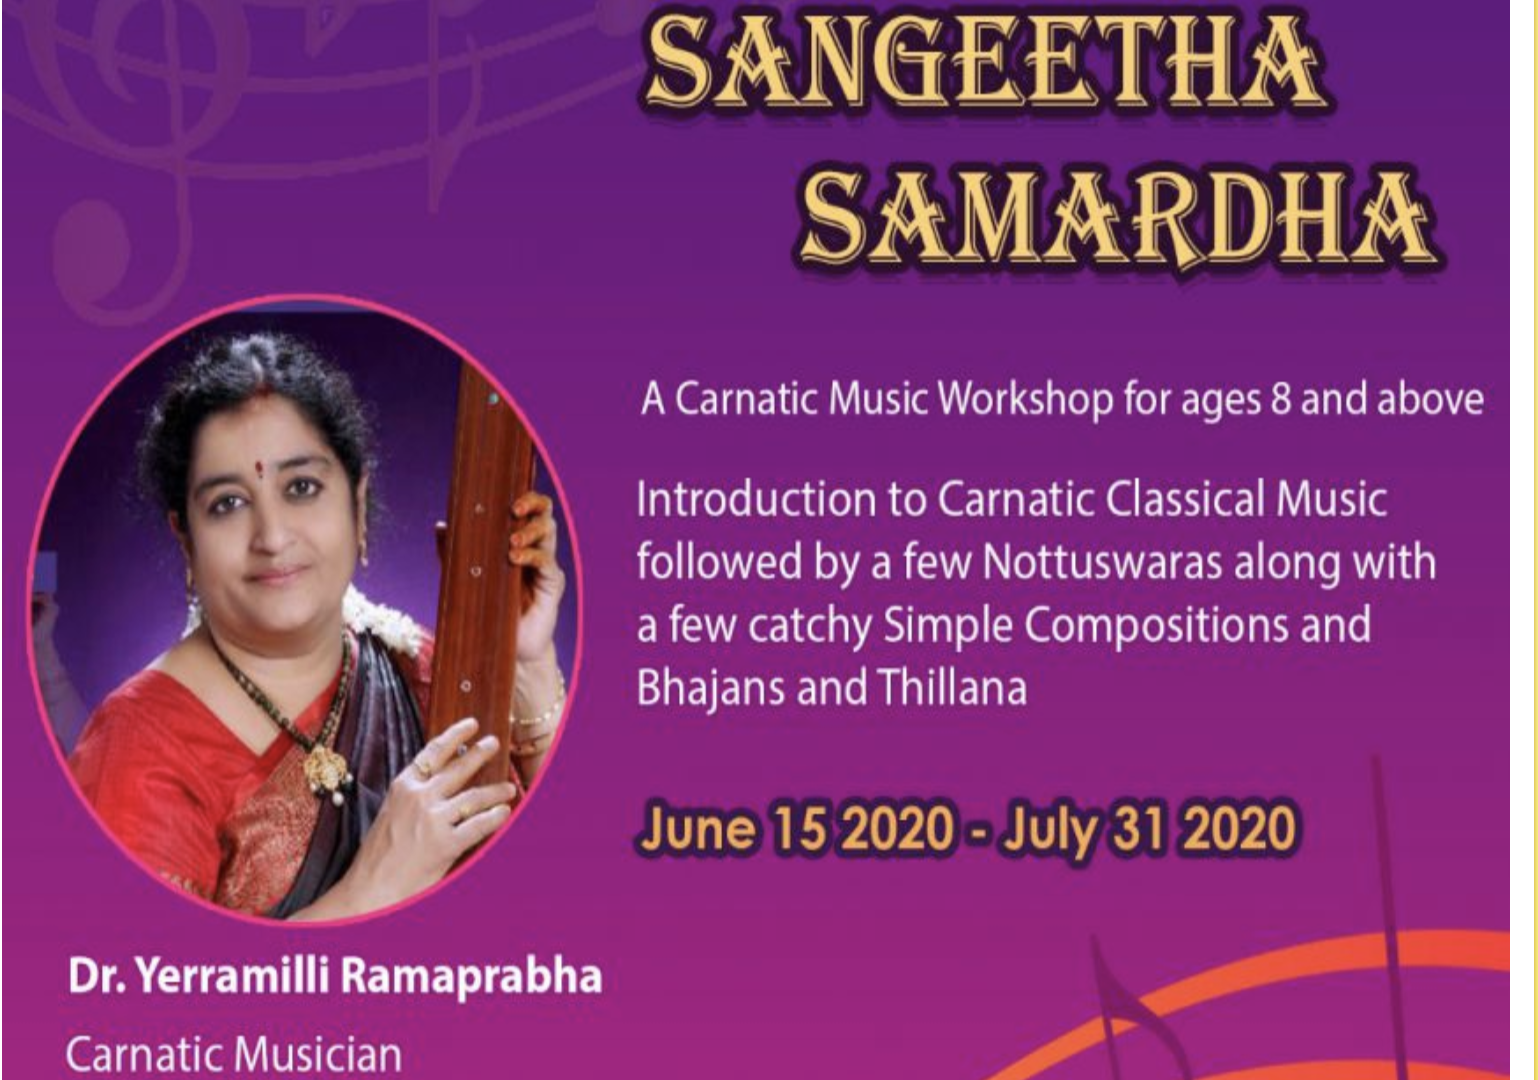 TASC AND SAMMOHANA - SANGEETHA SAMARDHA